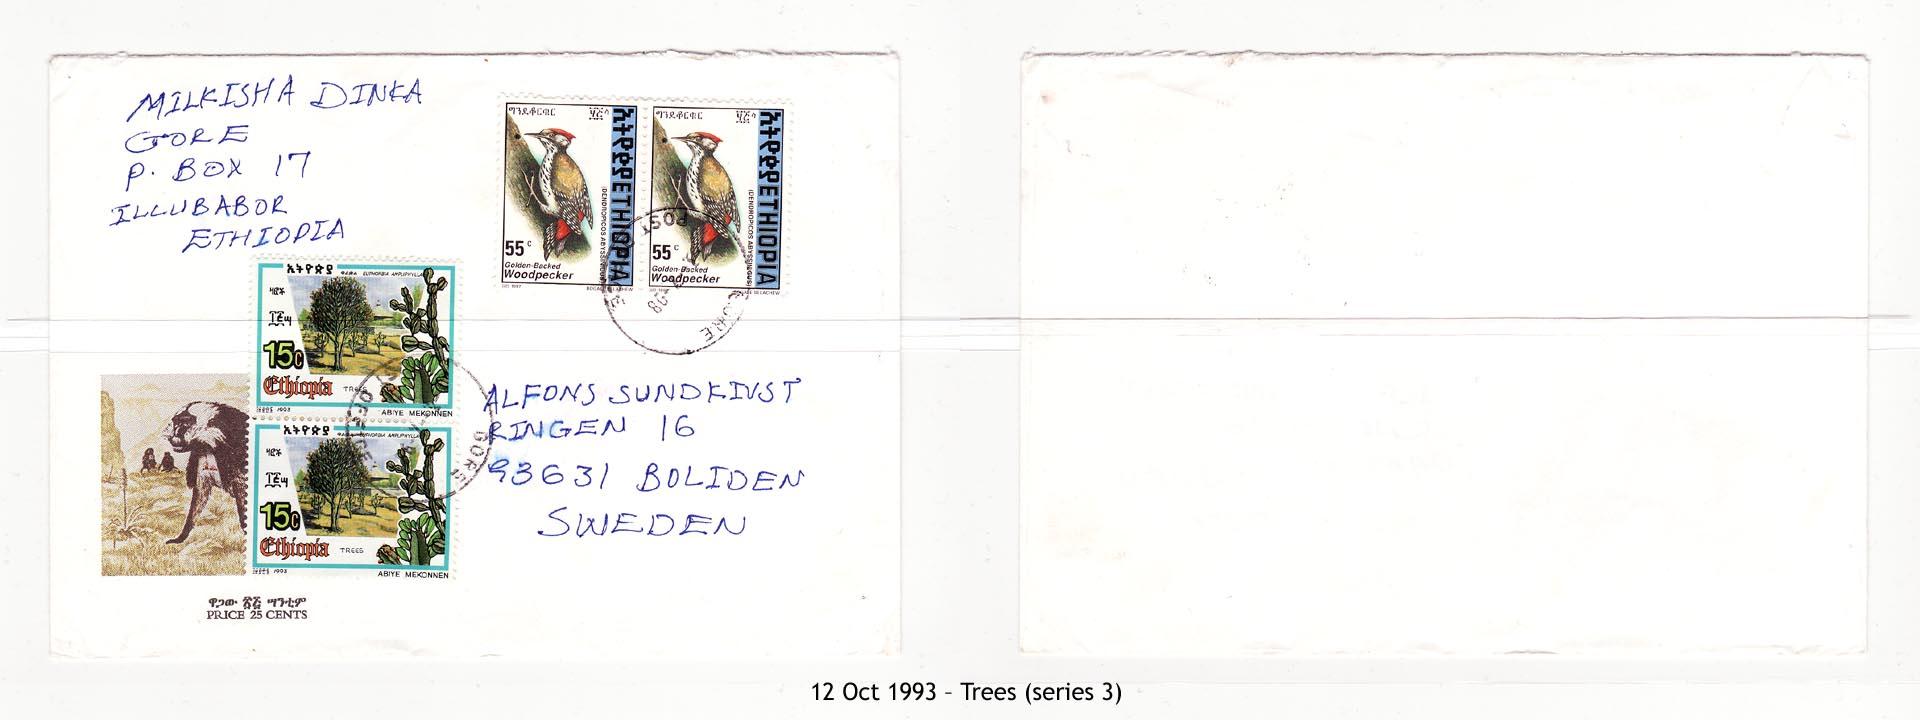 19931012 – Trees (series 3)